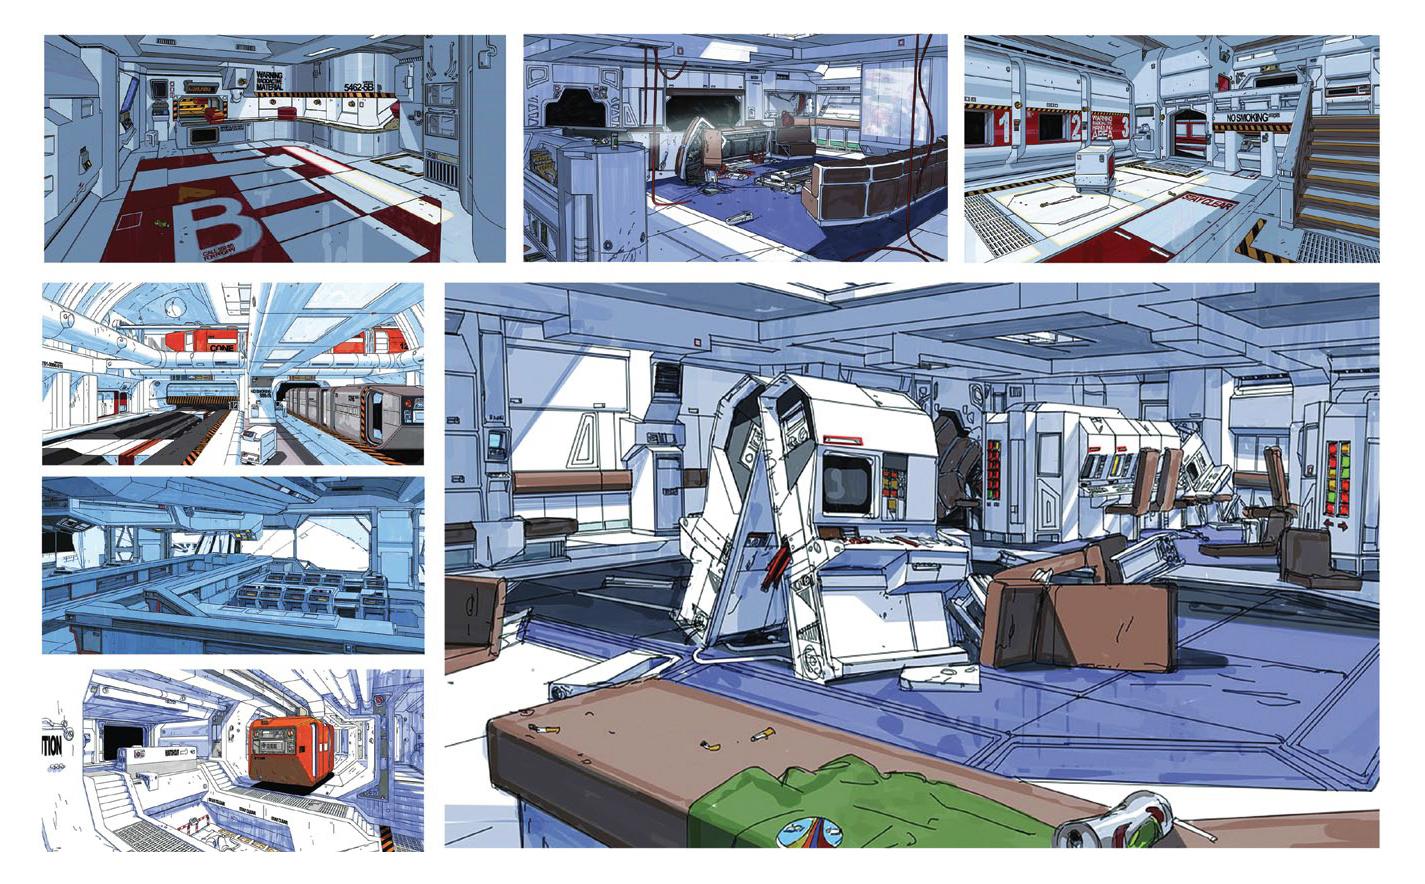 Alien 1979 Ship Concept Art